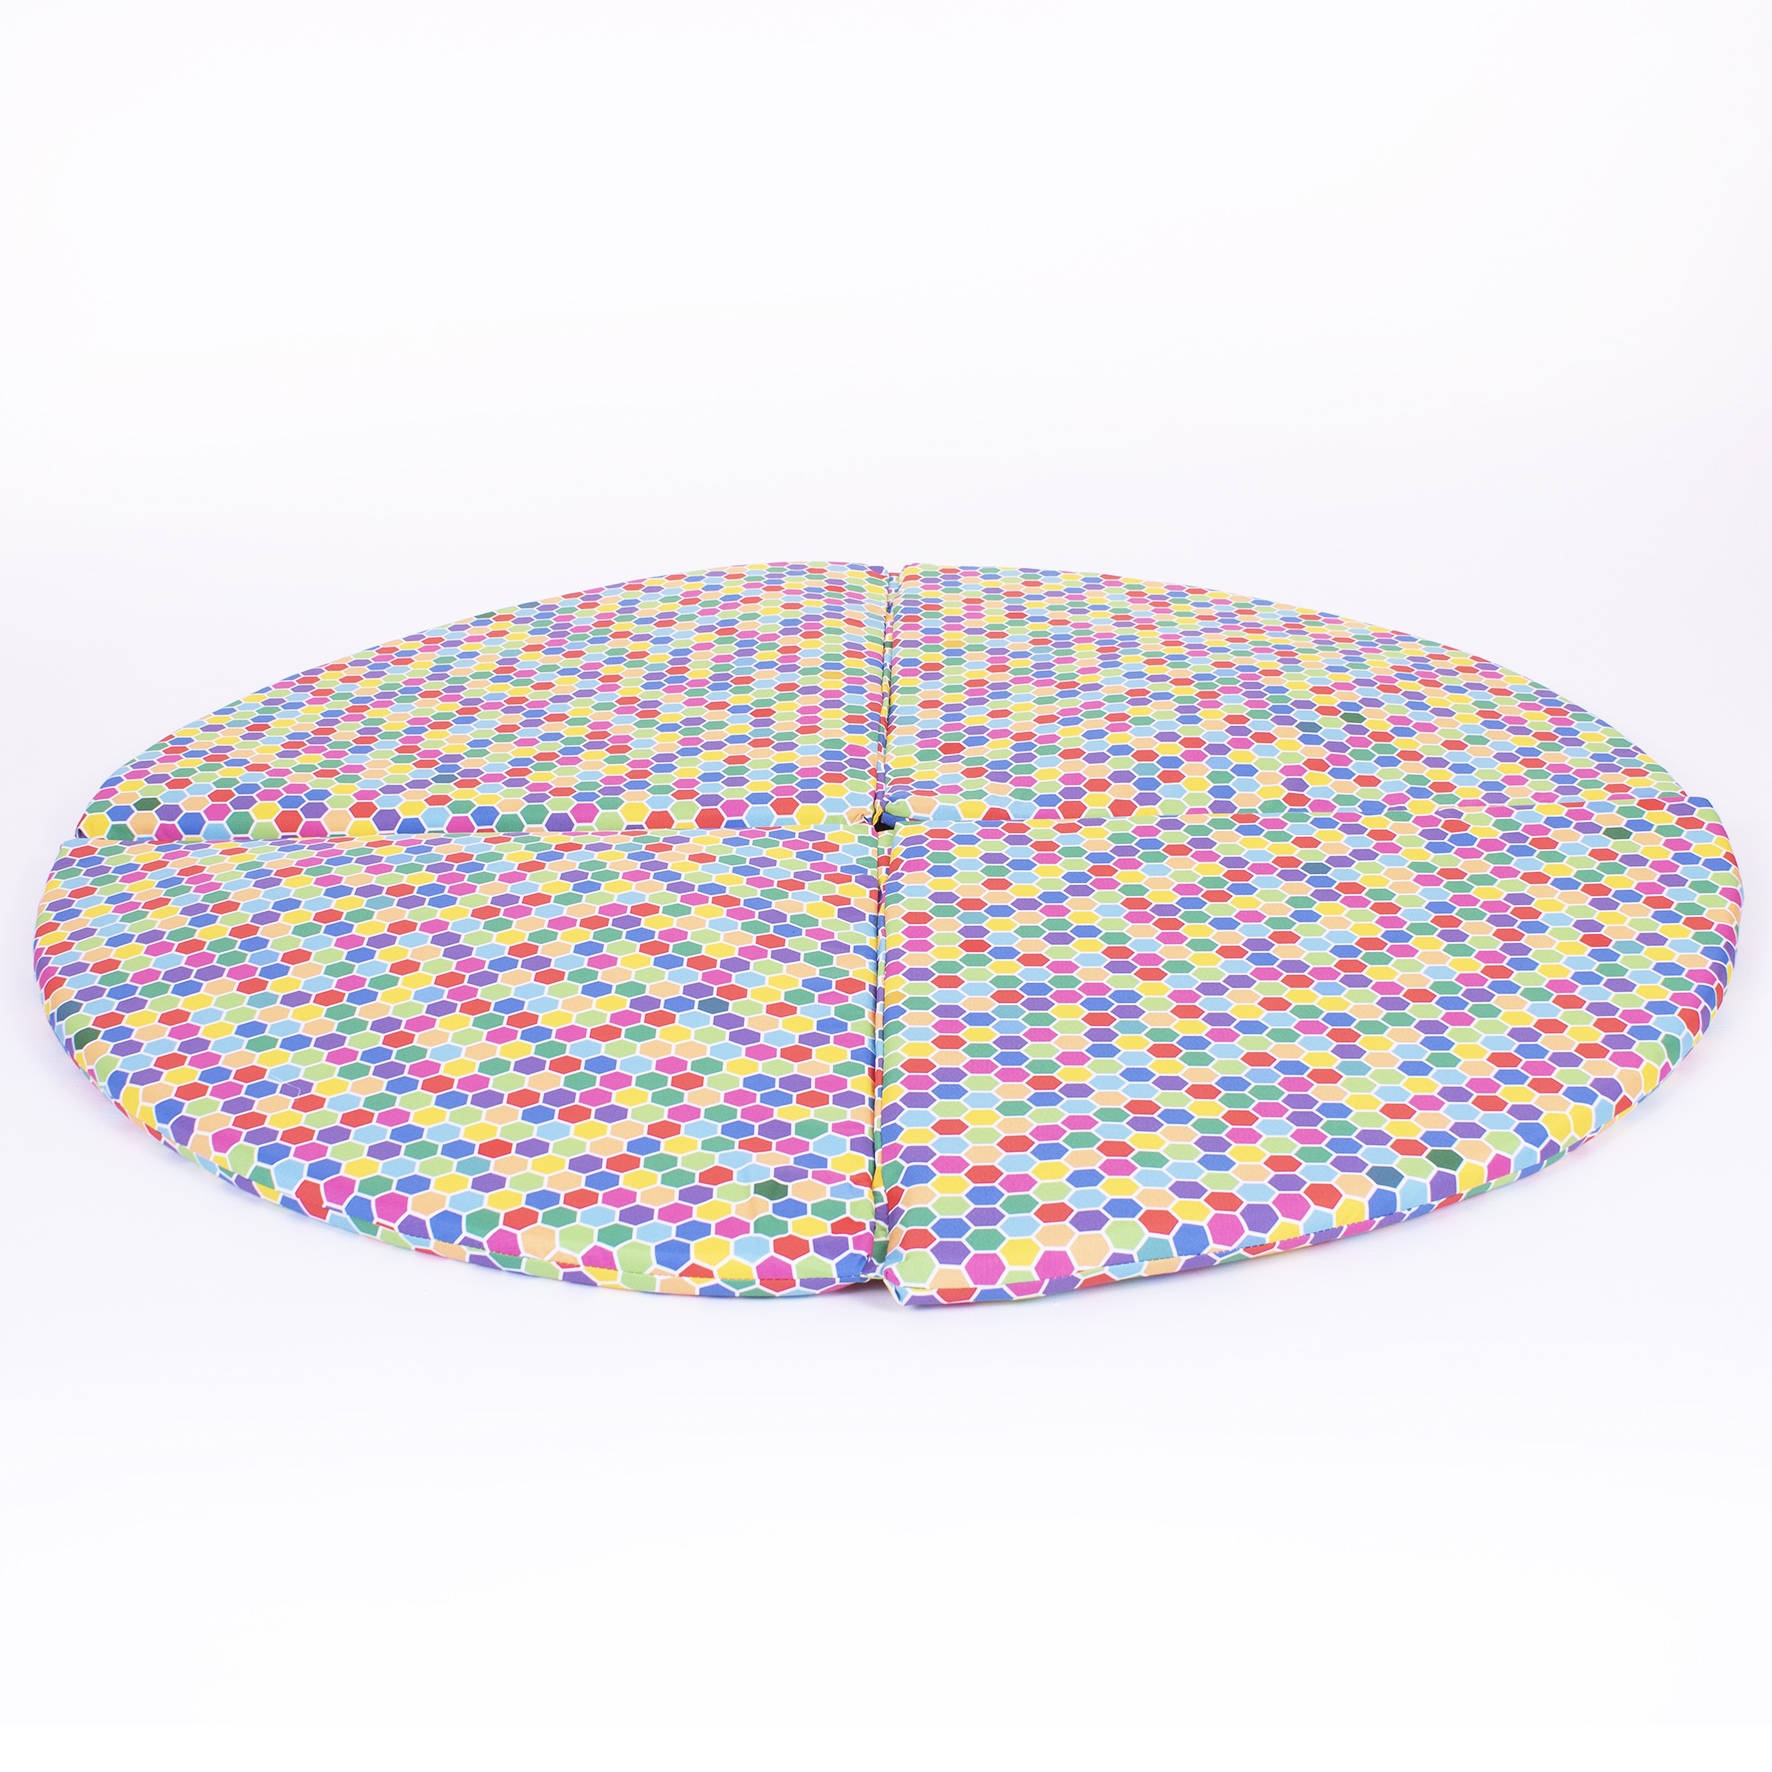 Eden-Multi-Way-Floor-Mat-Multi-1-300dpi